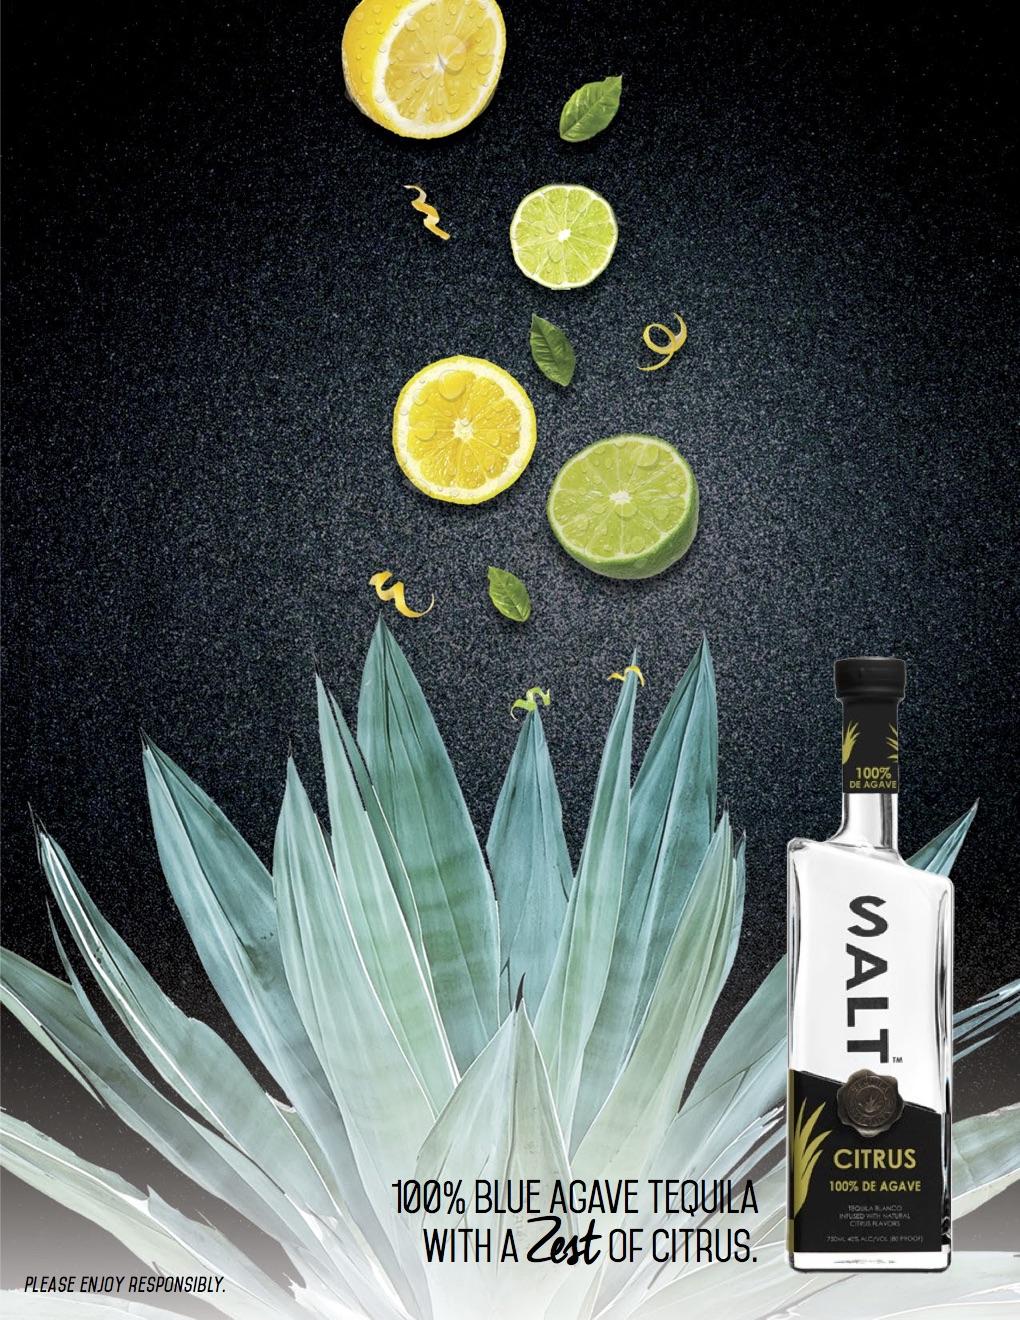 SALT_Tequila_Agave_R3 2.jpg